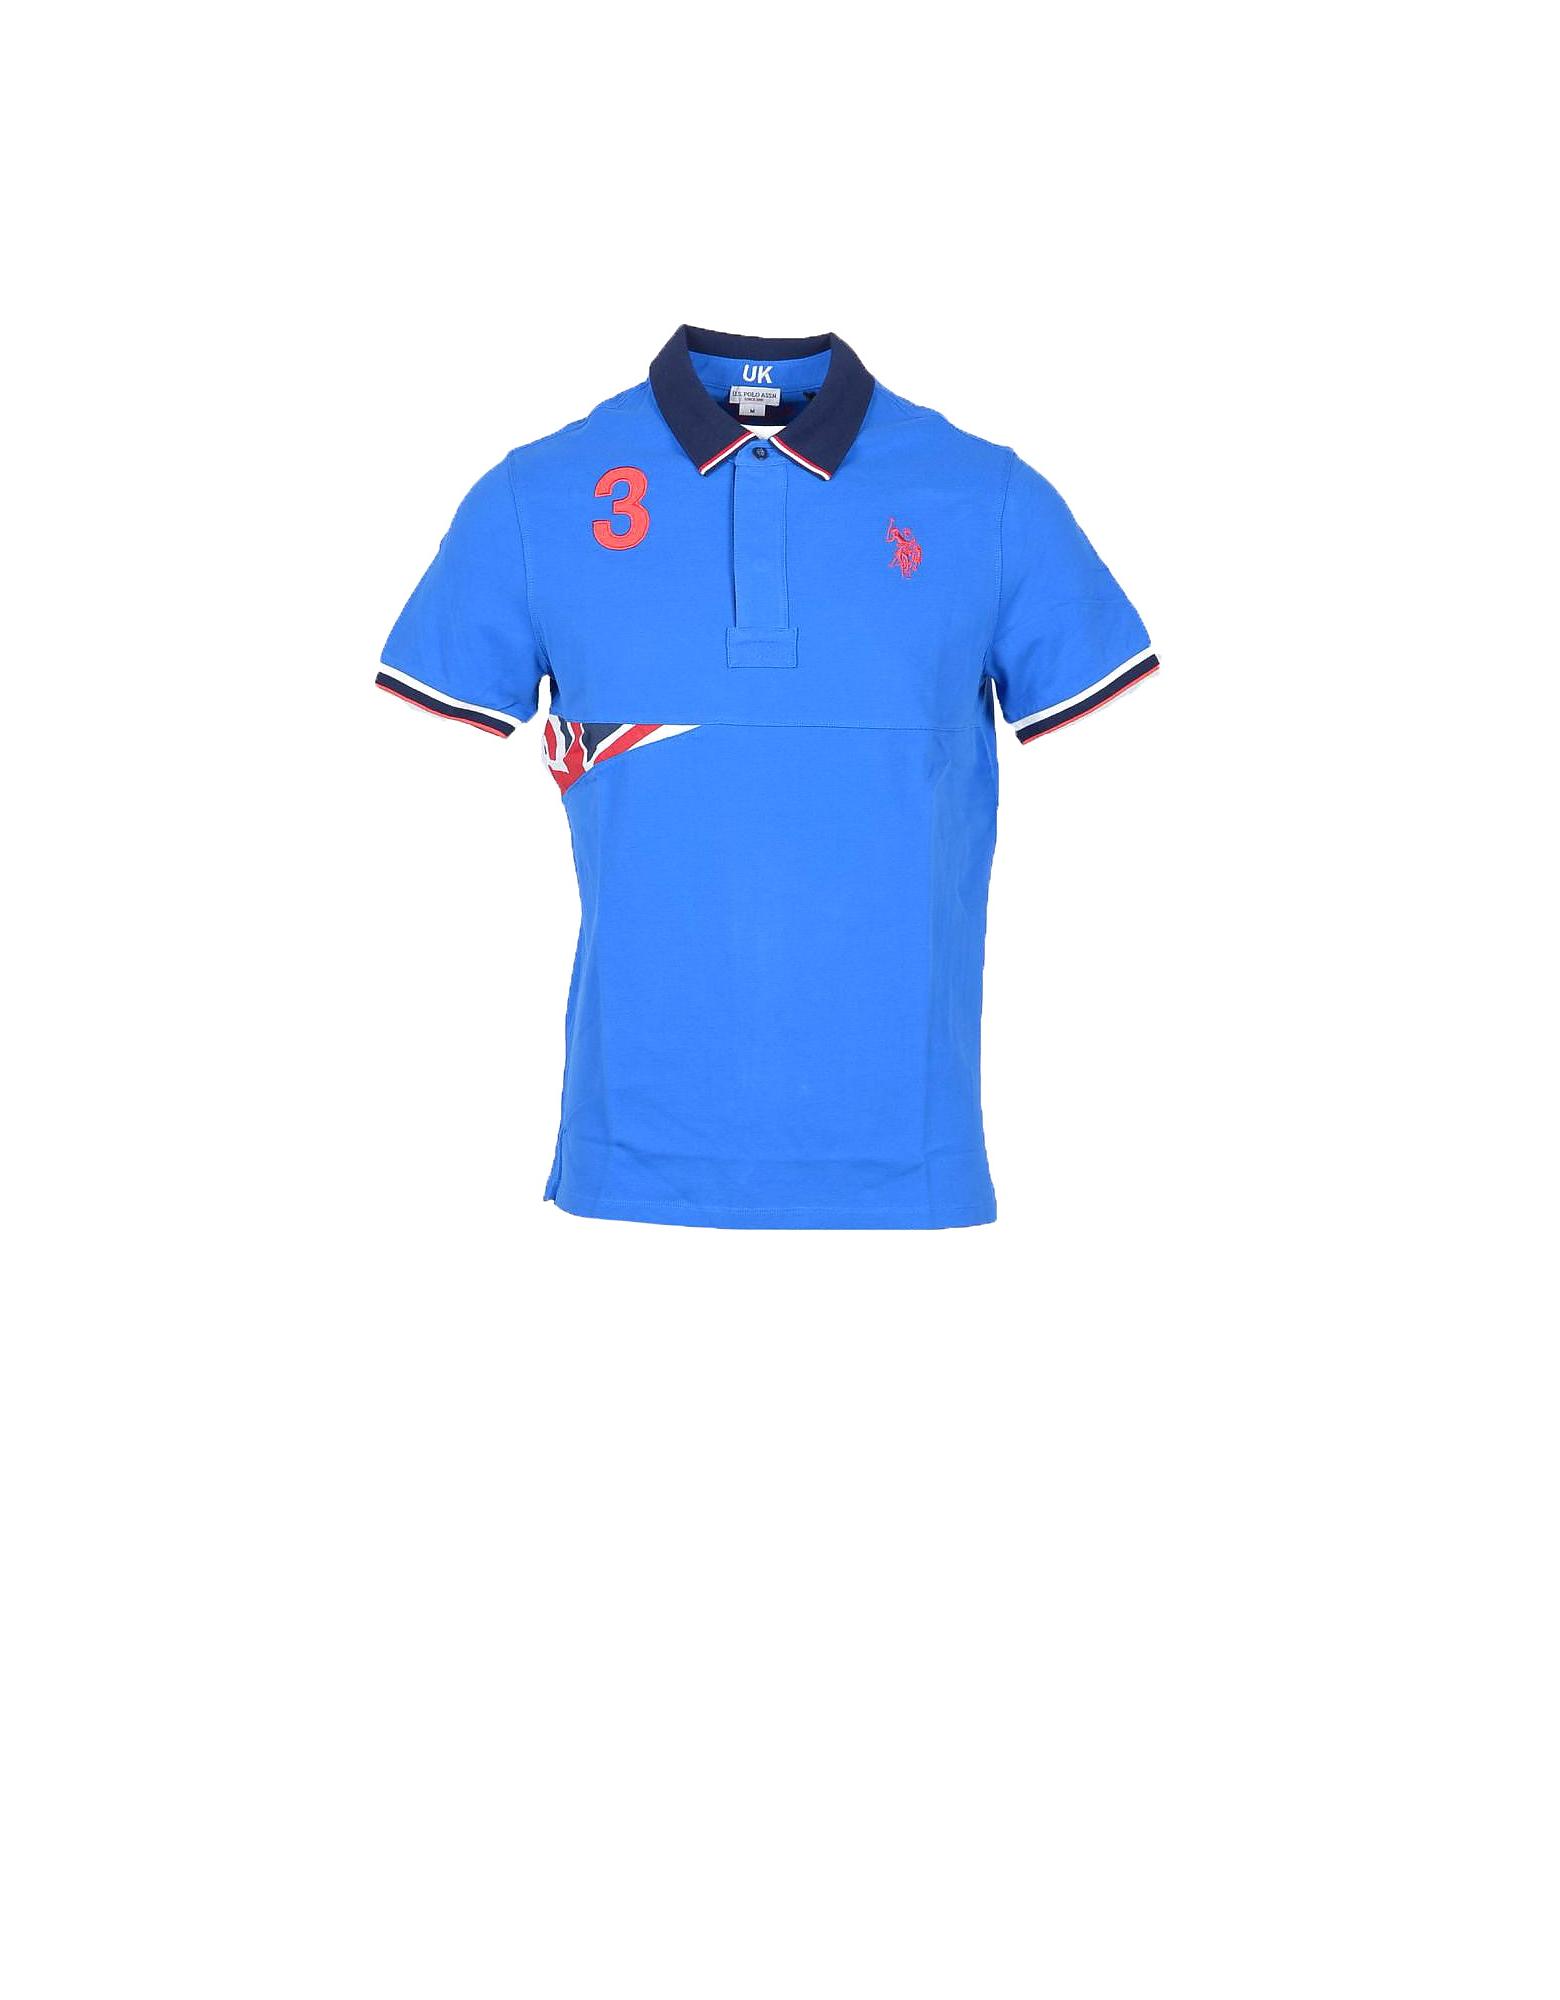 U.S. Polo Assn. U.S. Polo Assn. Polo Shirts Bluette Cotton Men's Polo Shirt w/UK Flag from FORZIERI | Accuweather